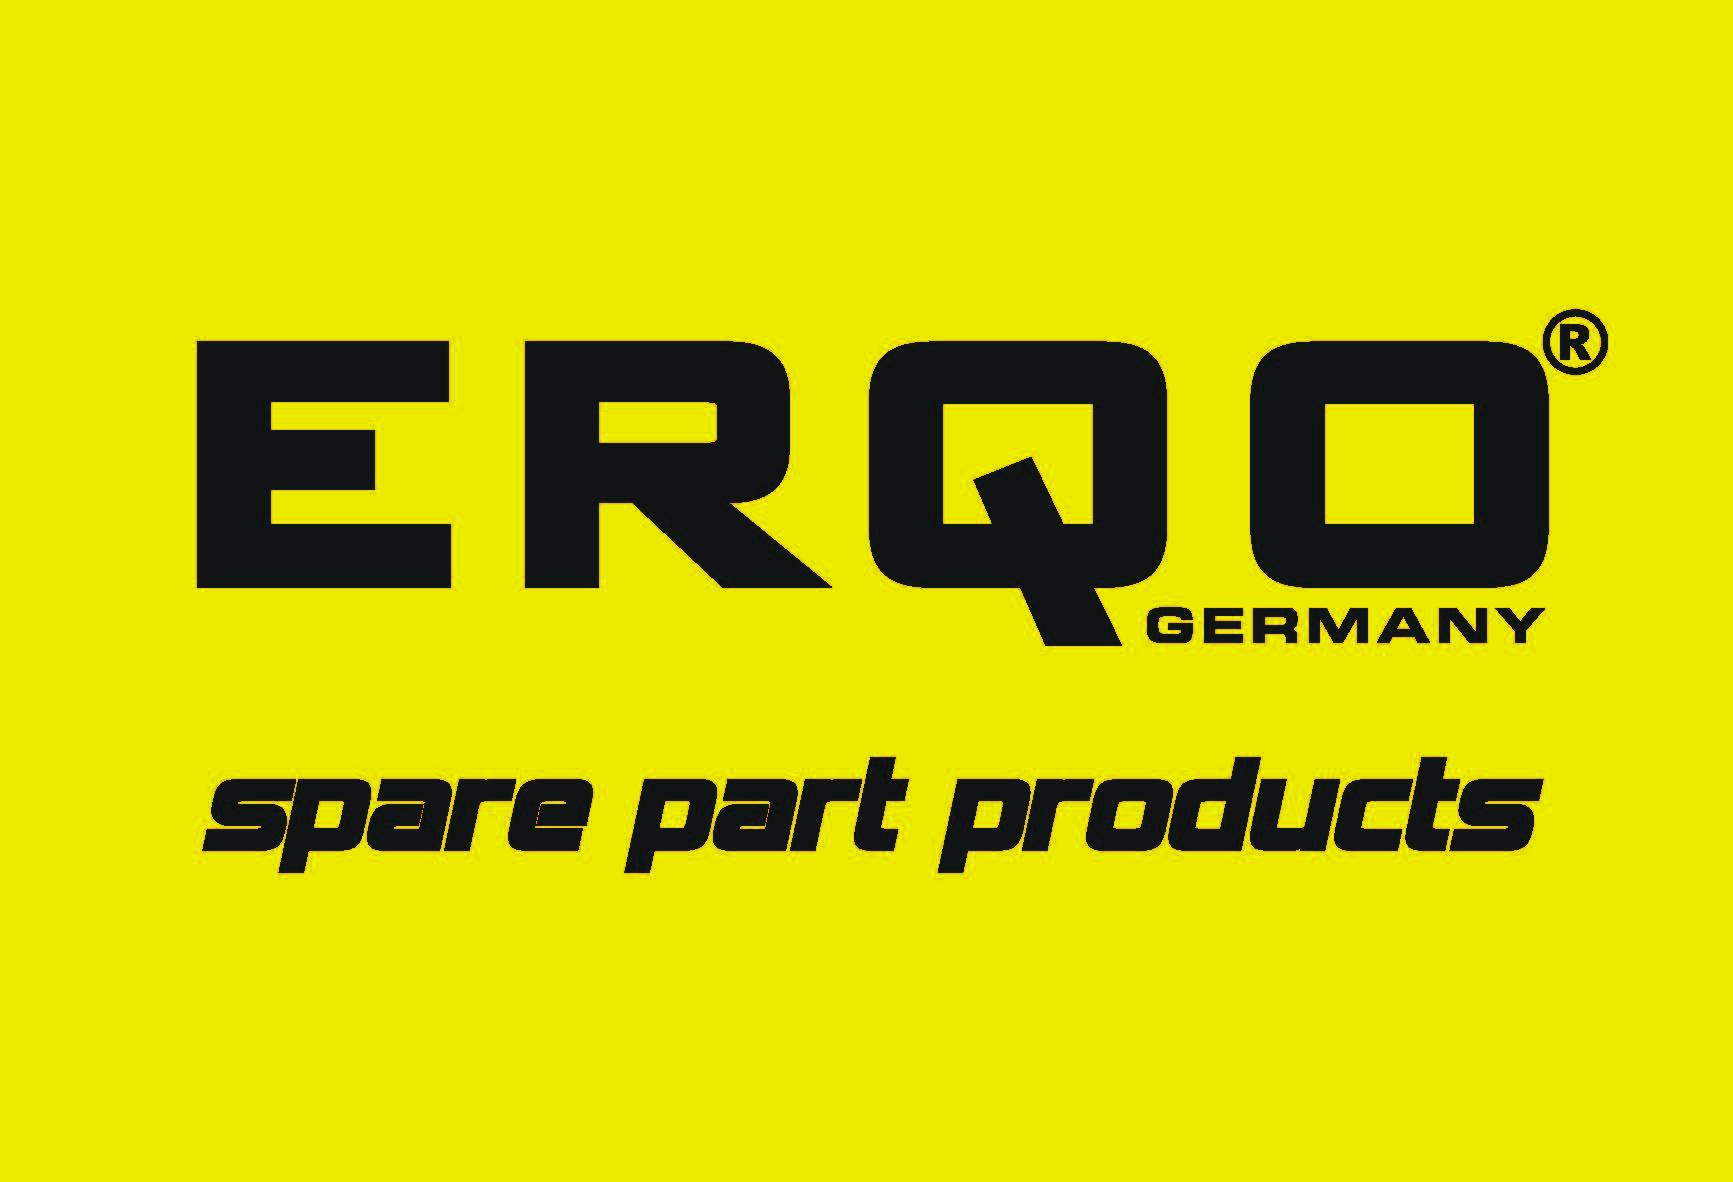 Erku Otomotiv Sanayi Ticaret Ltd Sti, Erqo Automotive